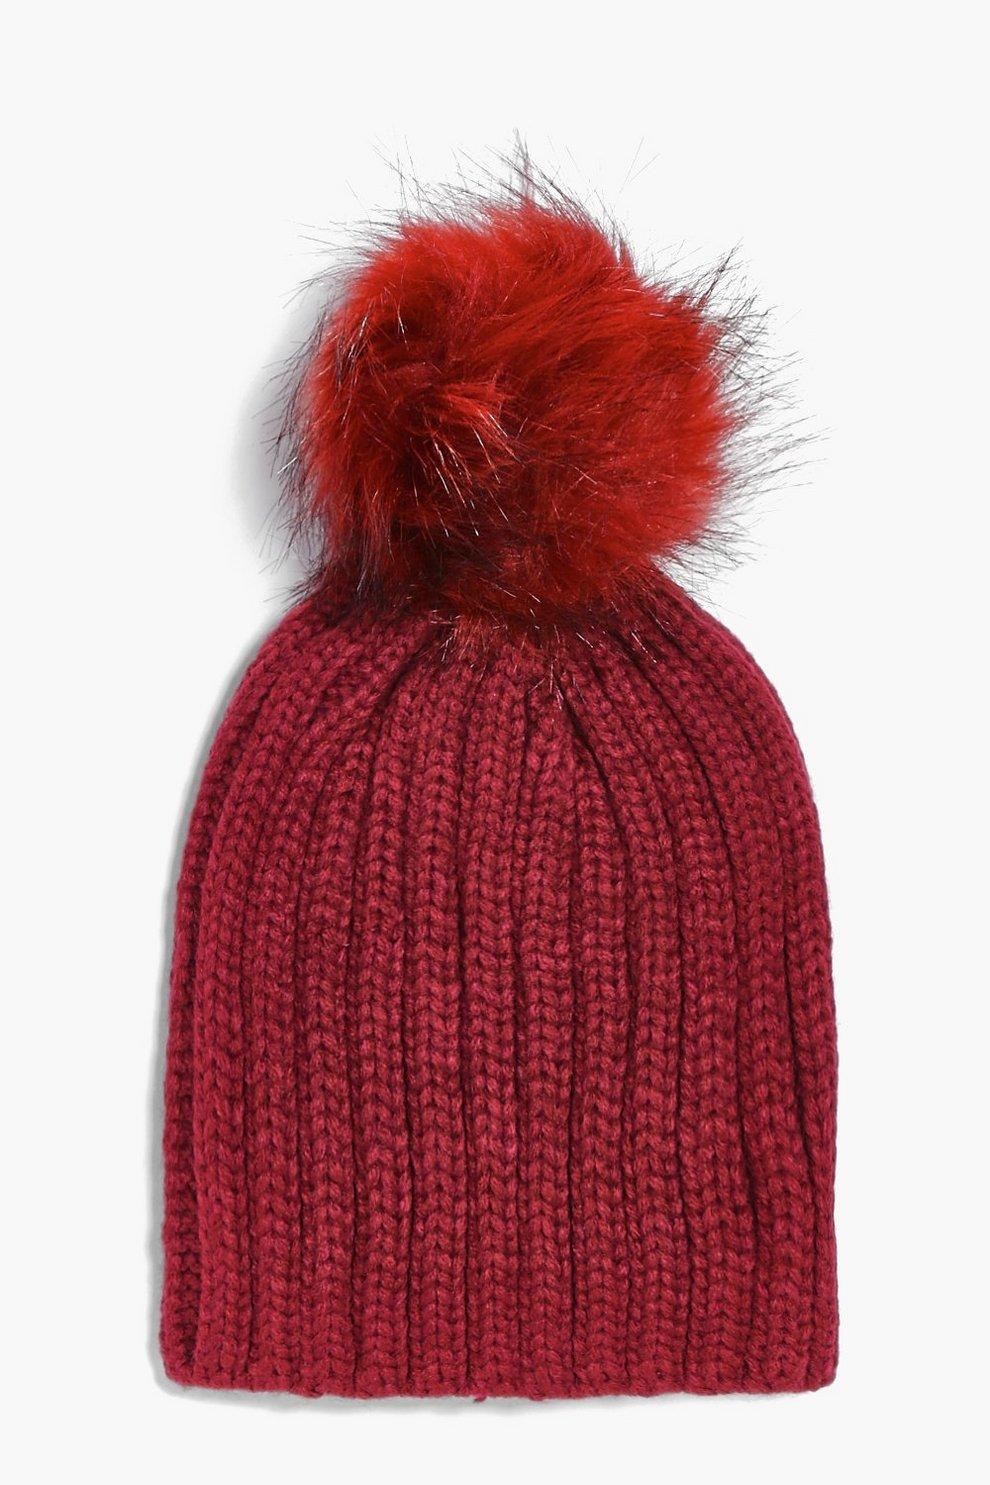 e2ce8972c71 Girls Faux Fur Pom Pom Knitted Hat